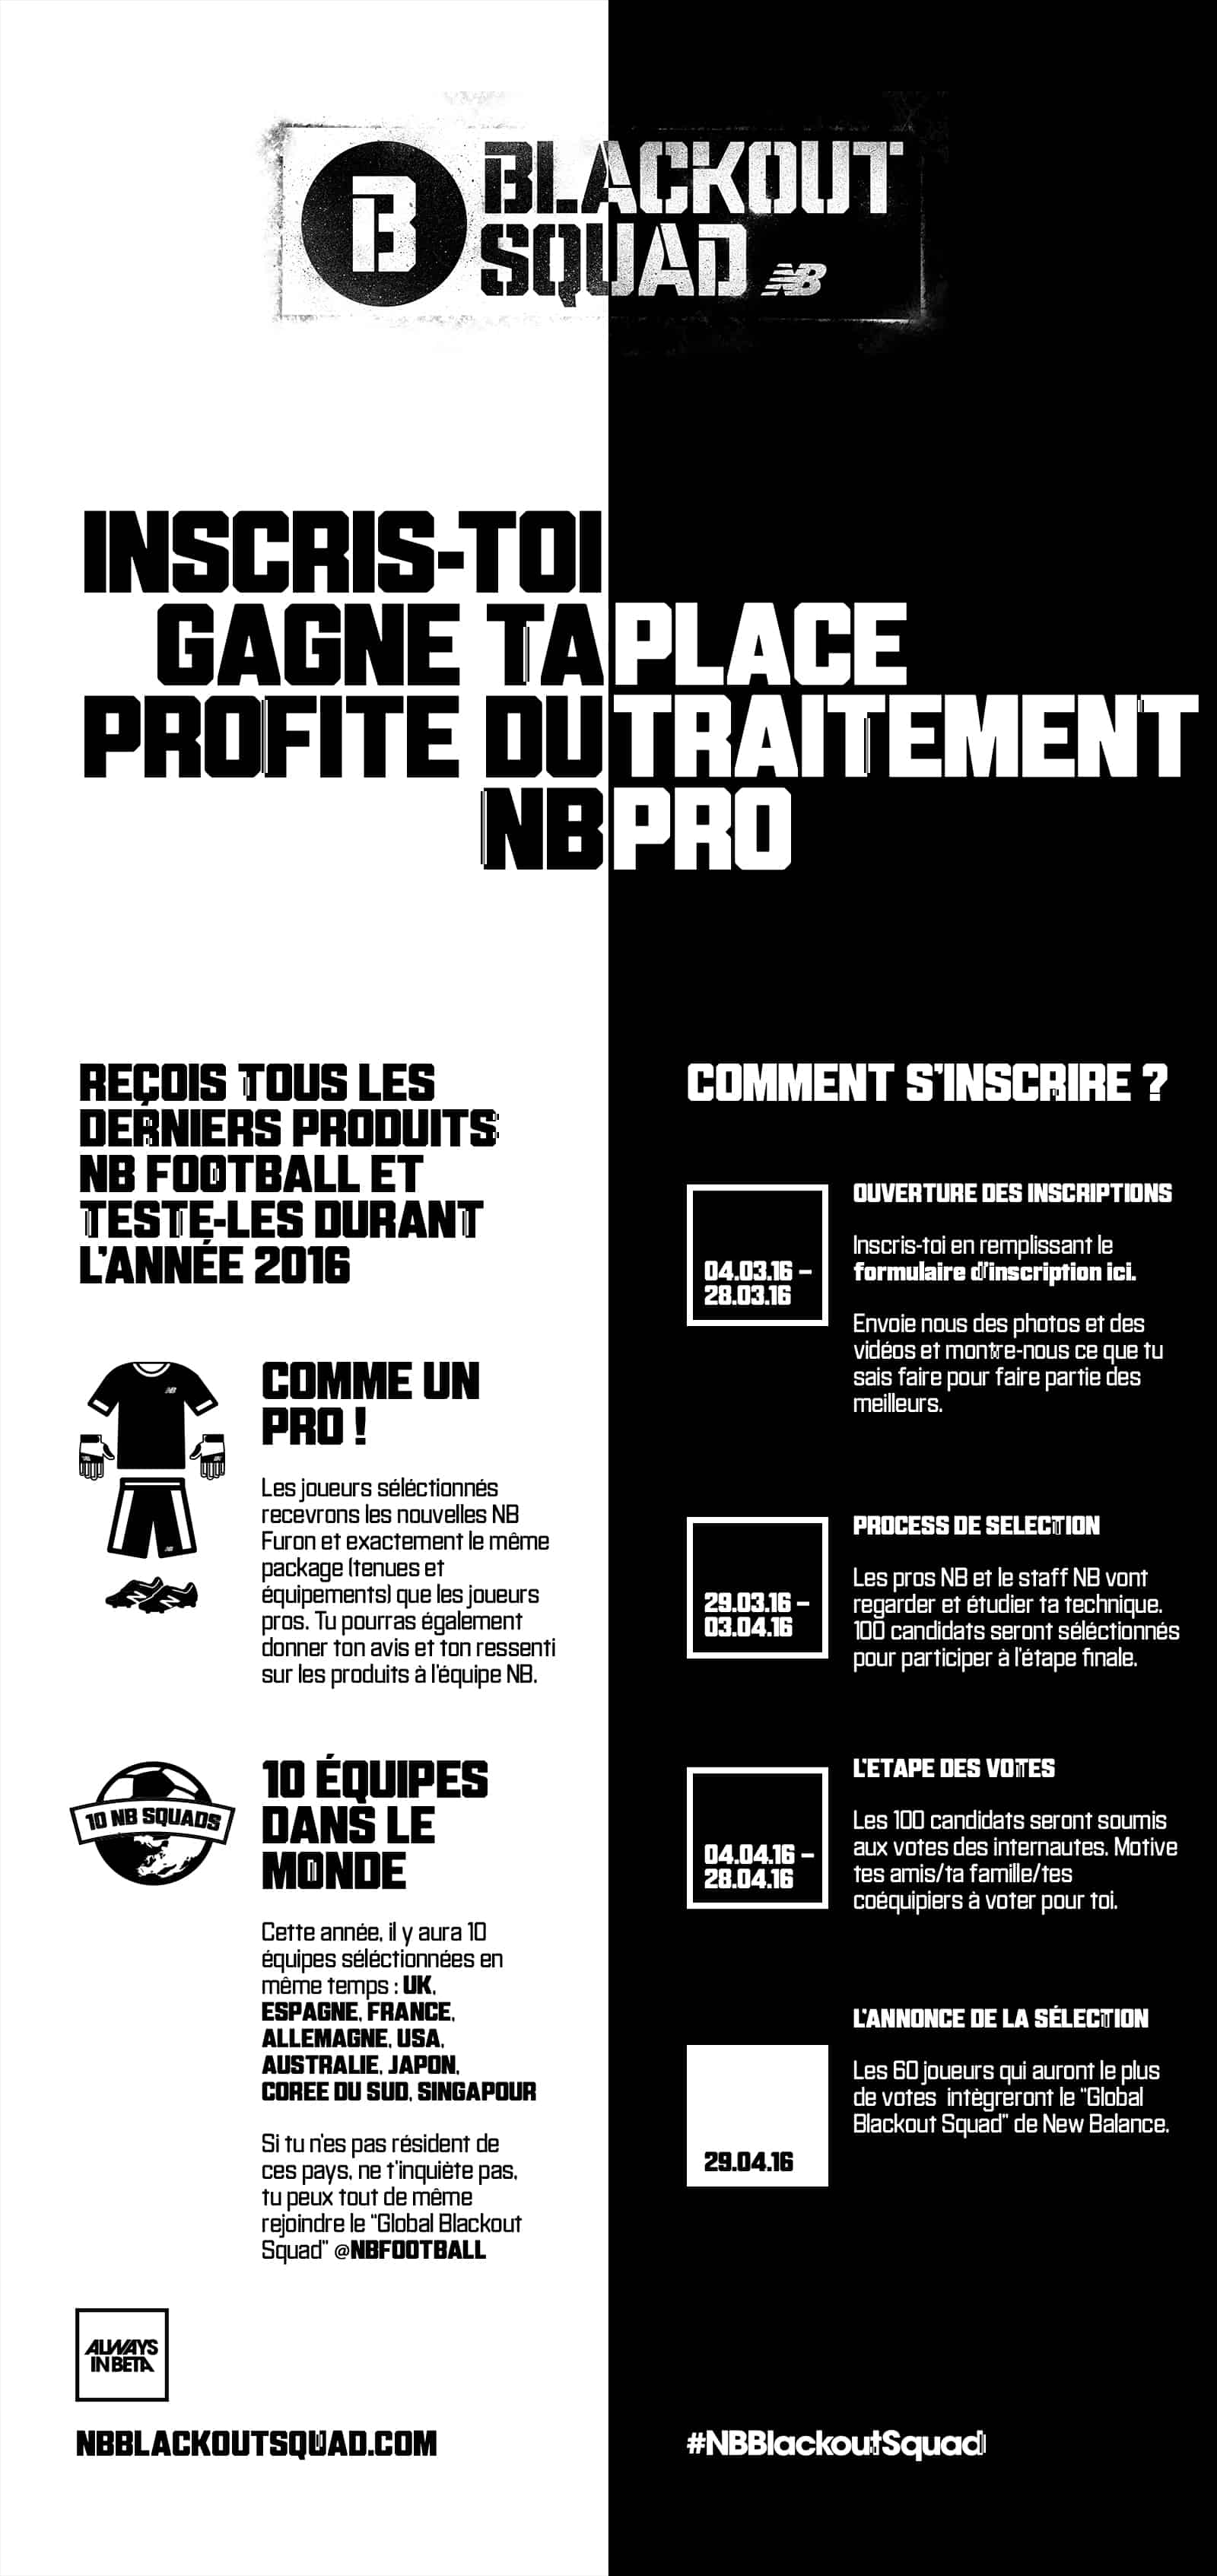 NB_Blackout-Squad_Infographic-Image-V3